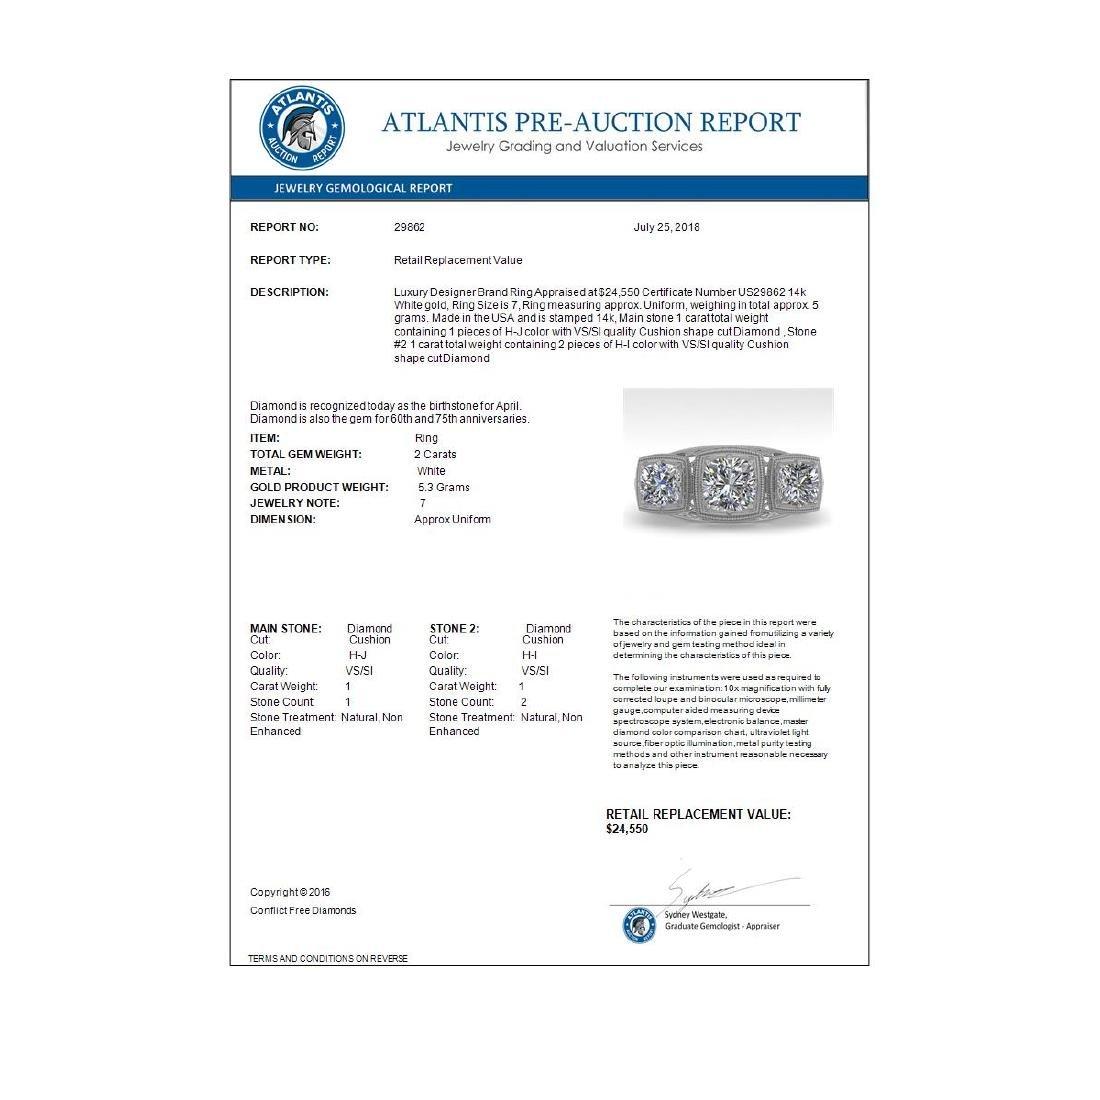 2 CTW VS/SI Cushion Cut Diamond Ring Art Deco 14K White - 4